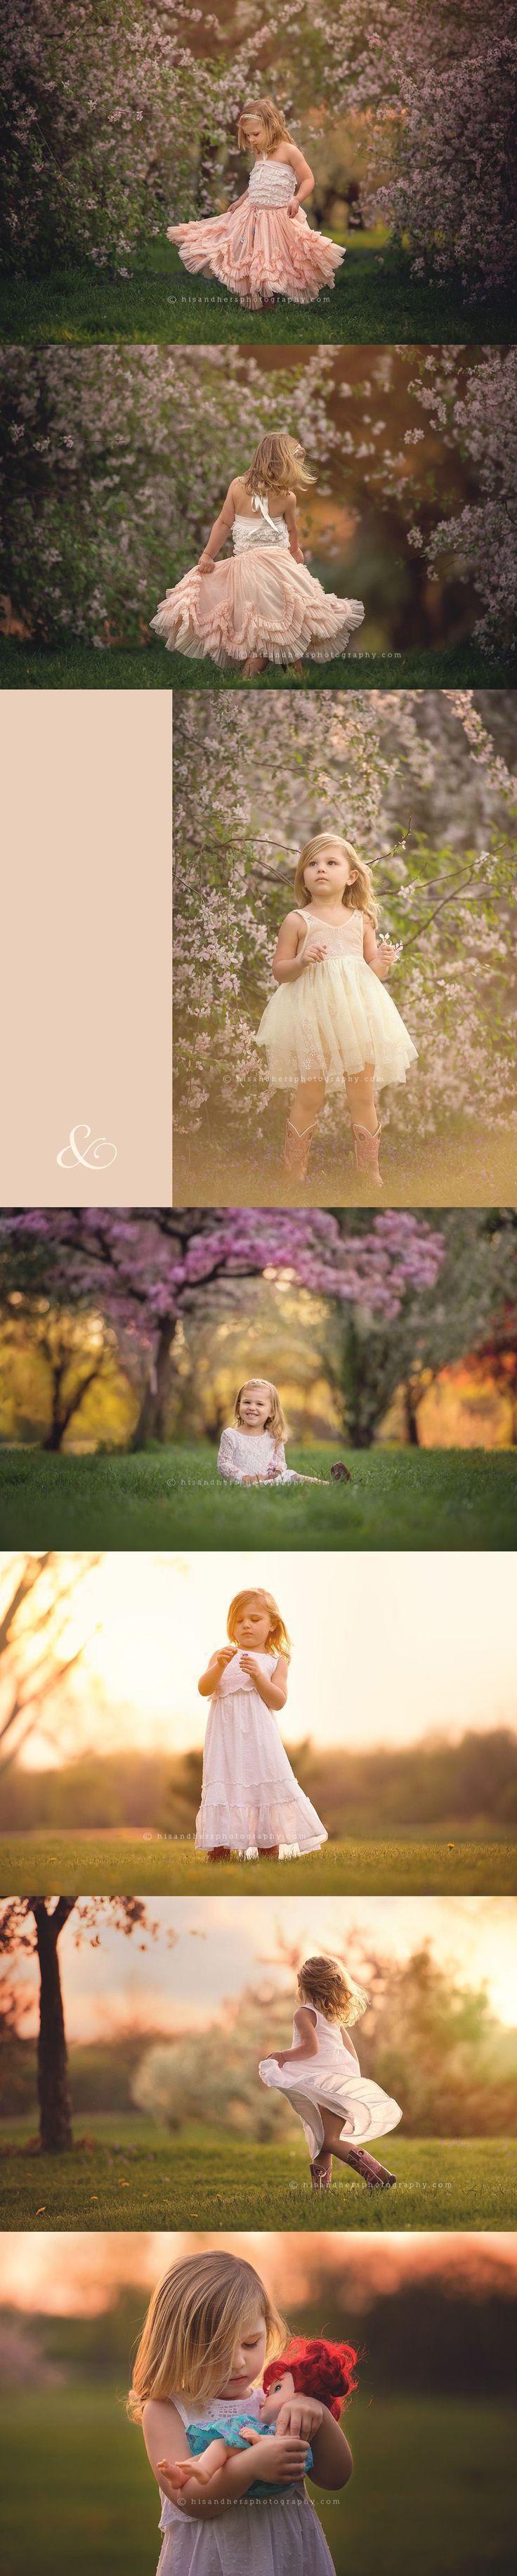 Child | Isadora, Spring Blooms